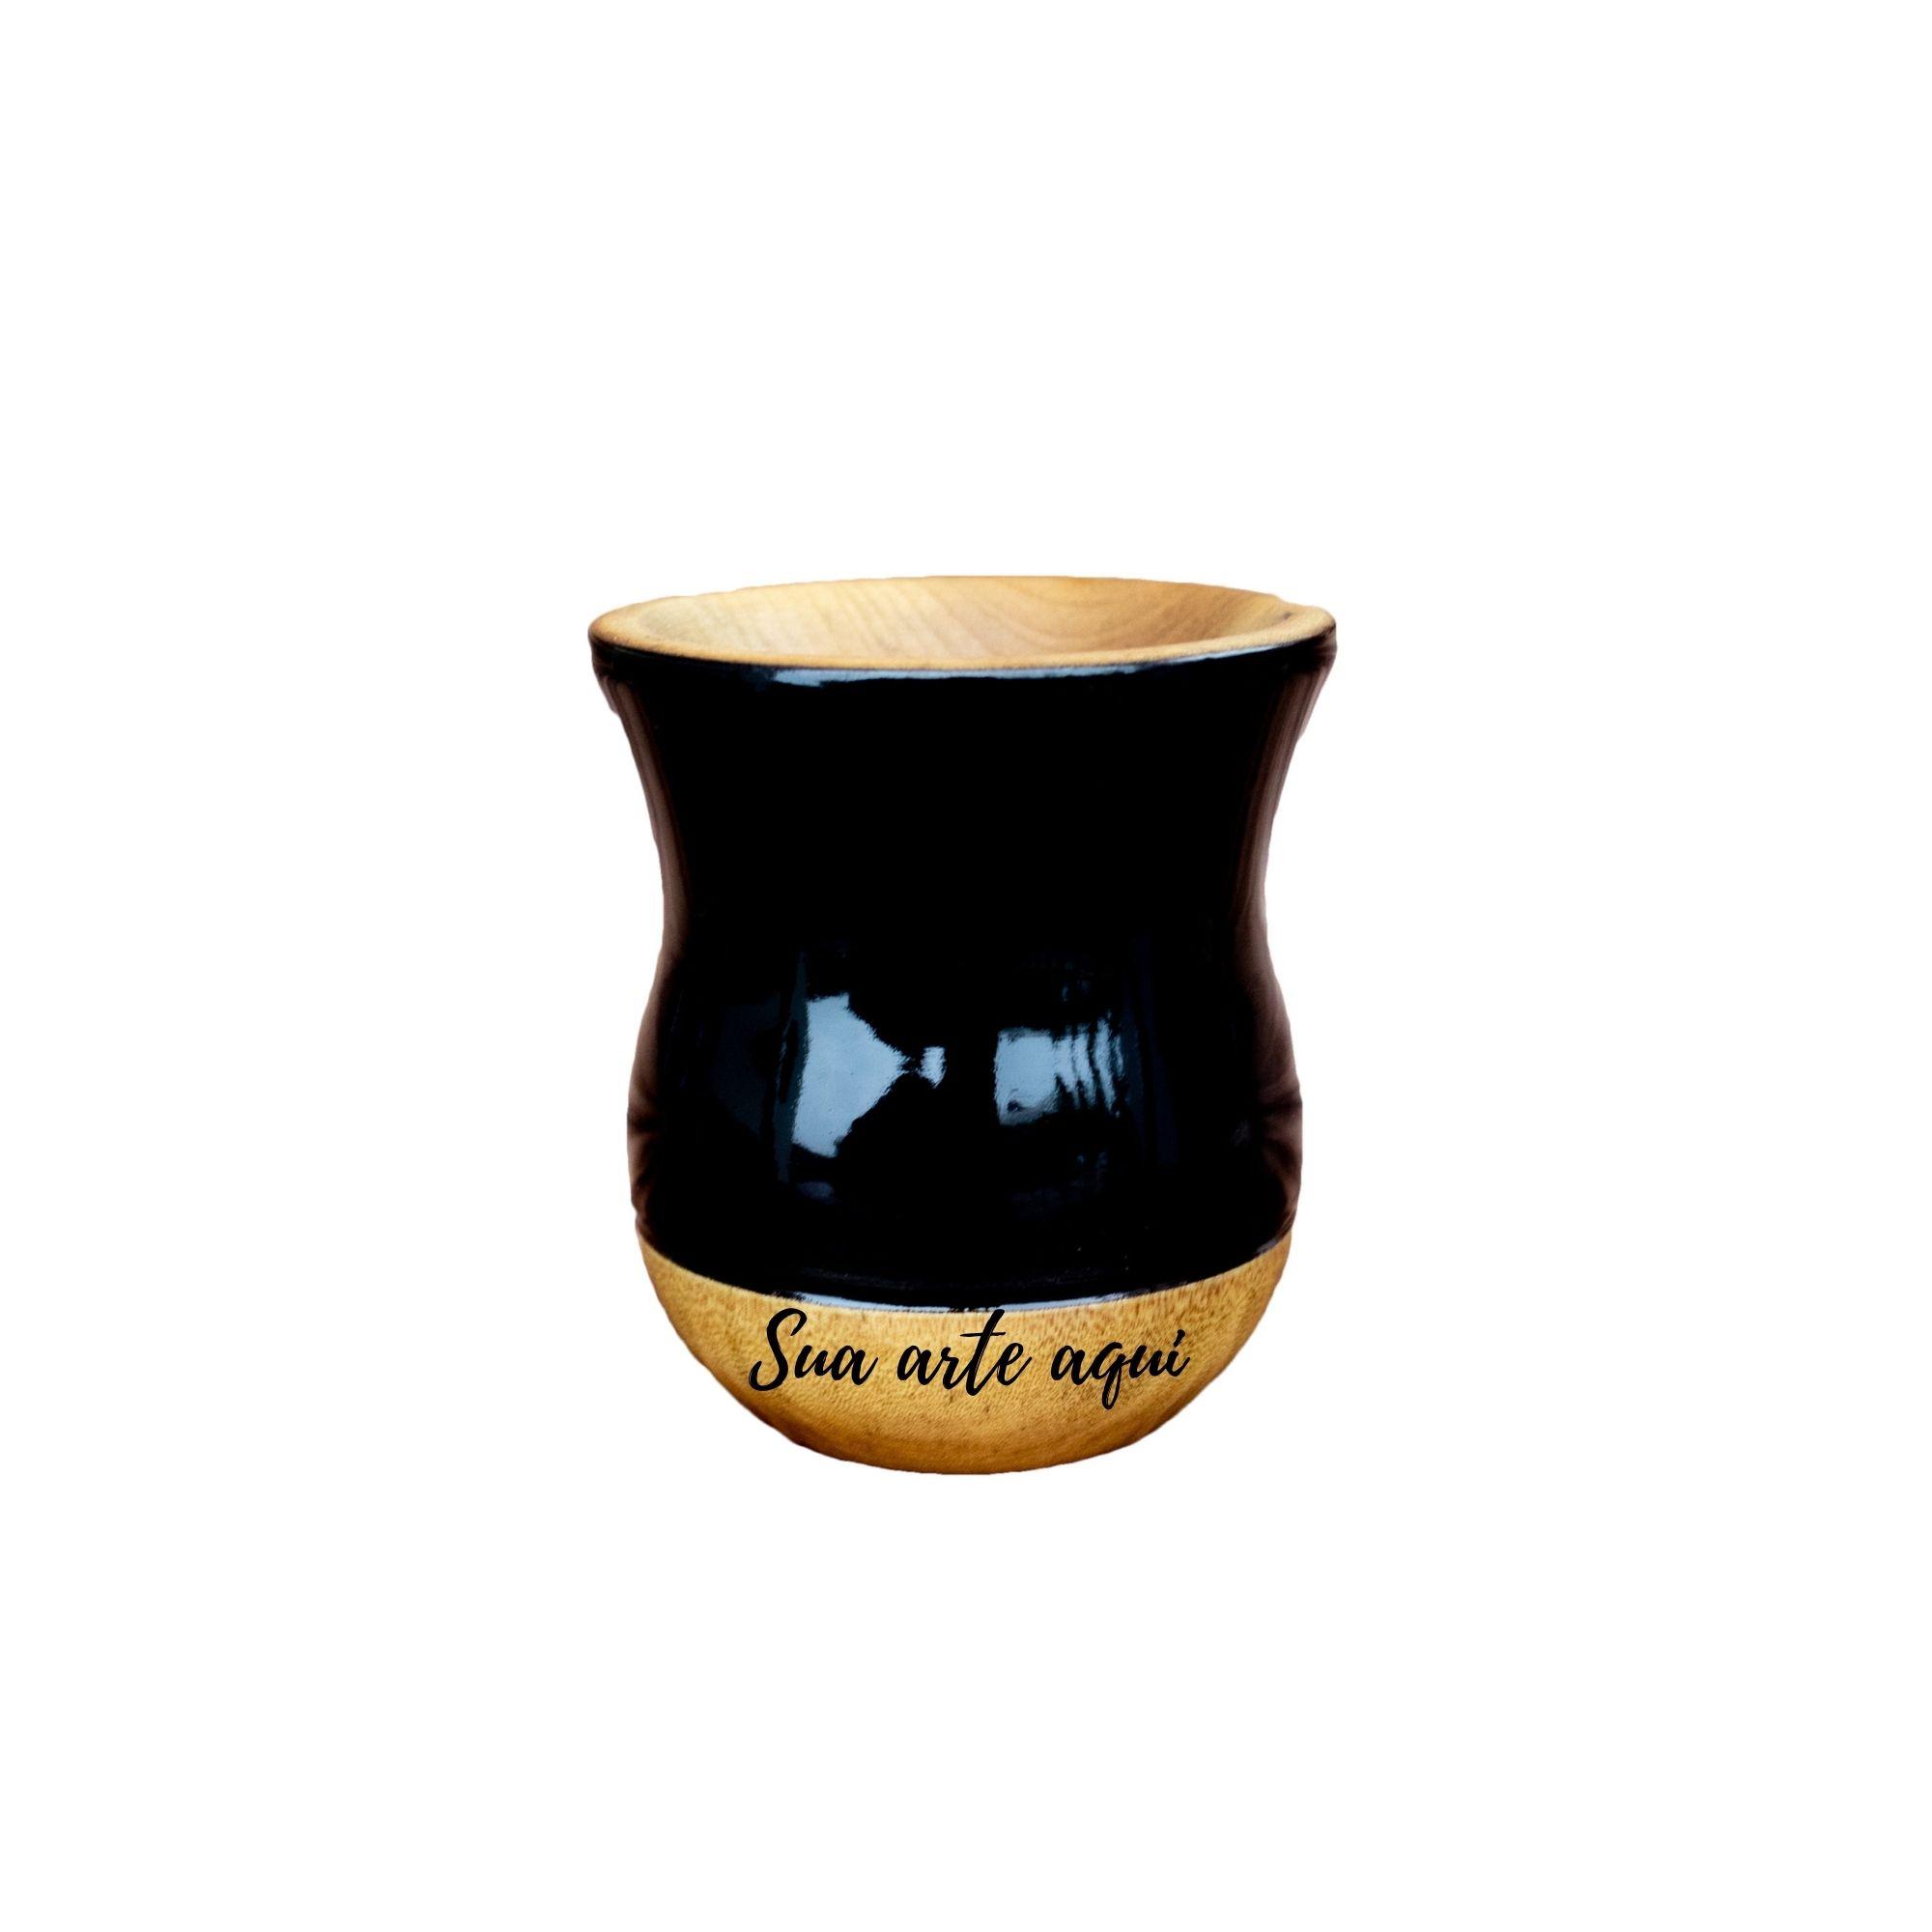 Cuia Madeira bicolor imbuia preta personalizada